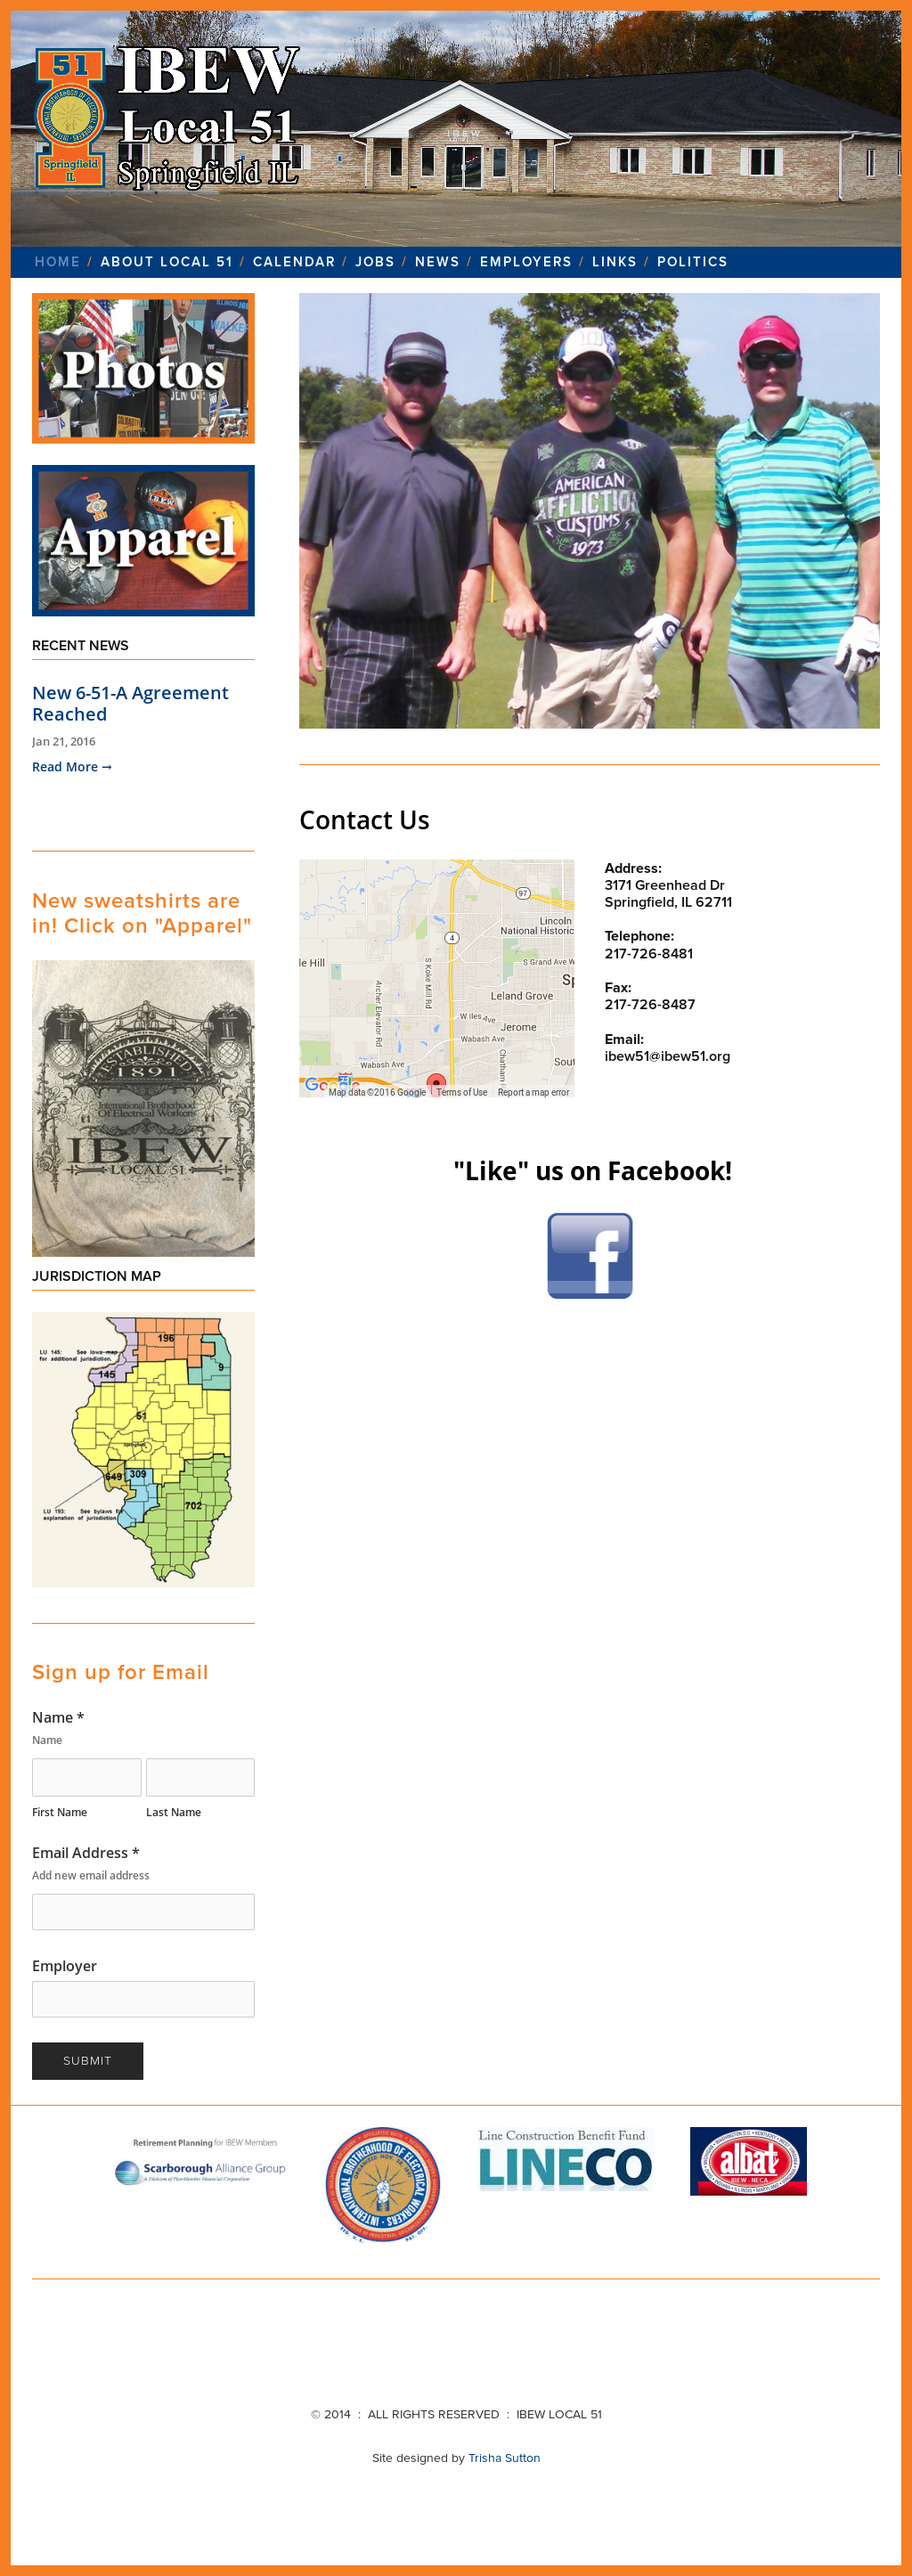 Ibew Illinois Map.Ibew Local 51 International Brotherhood Of Electrical Workers